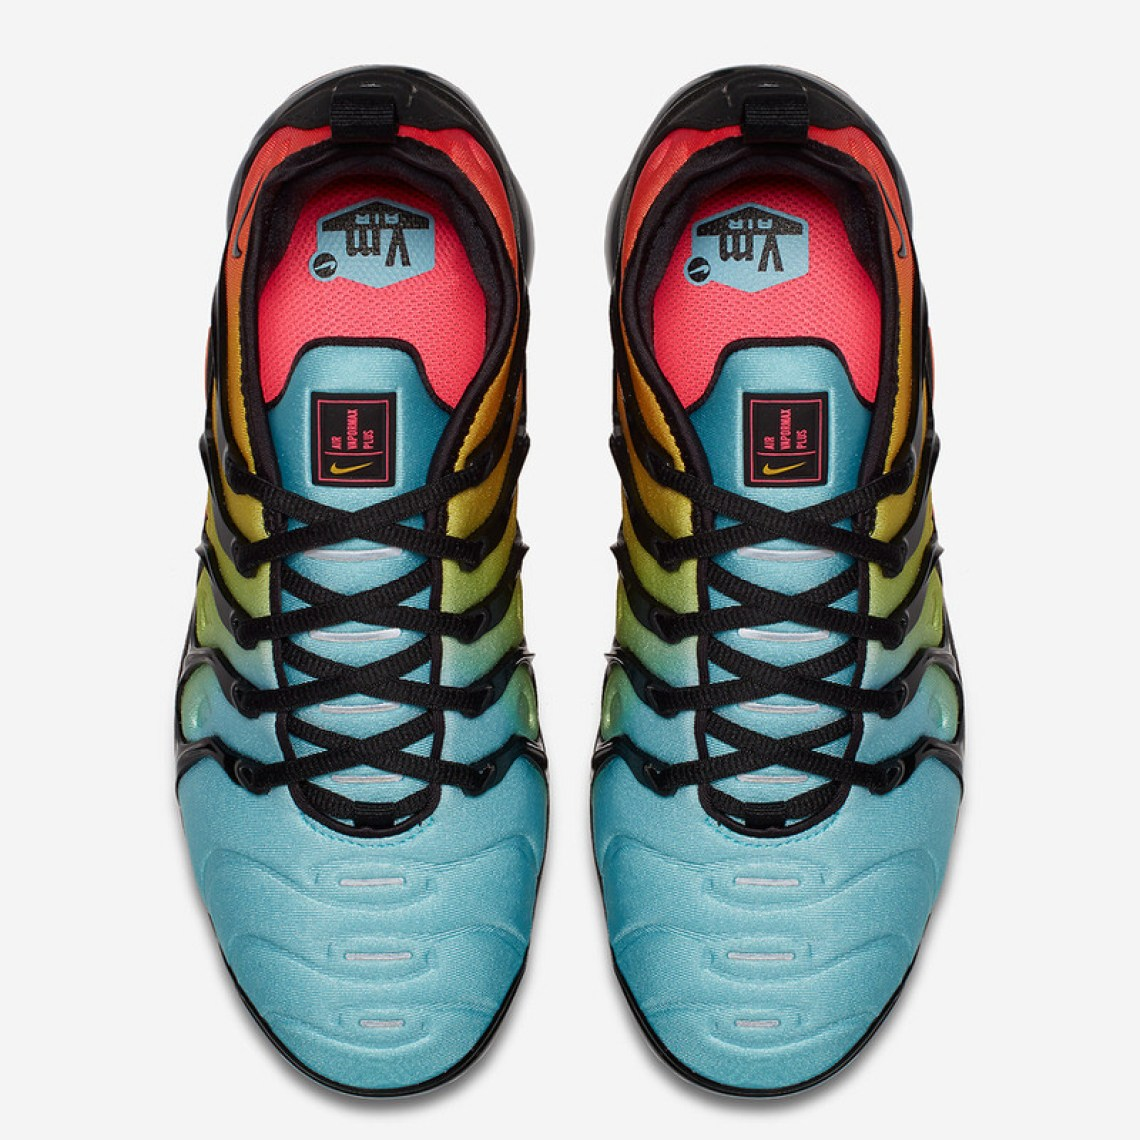 new product 88481 3650e ... Nike Air VaporMax Plus